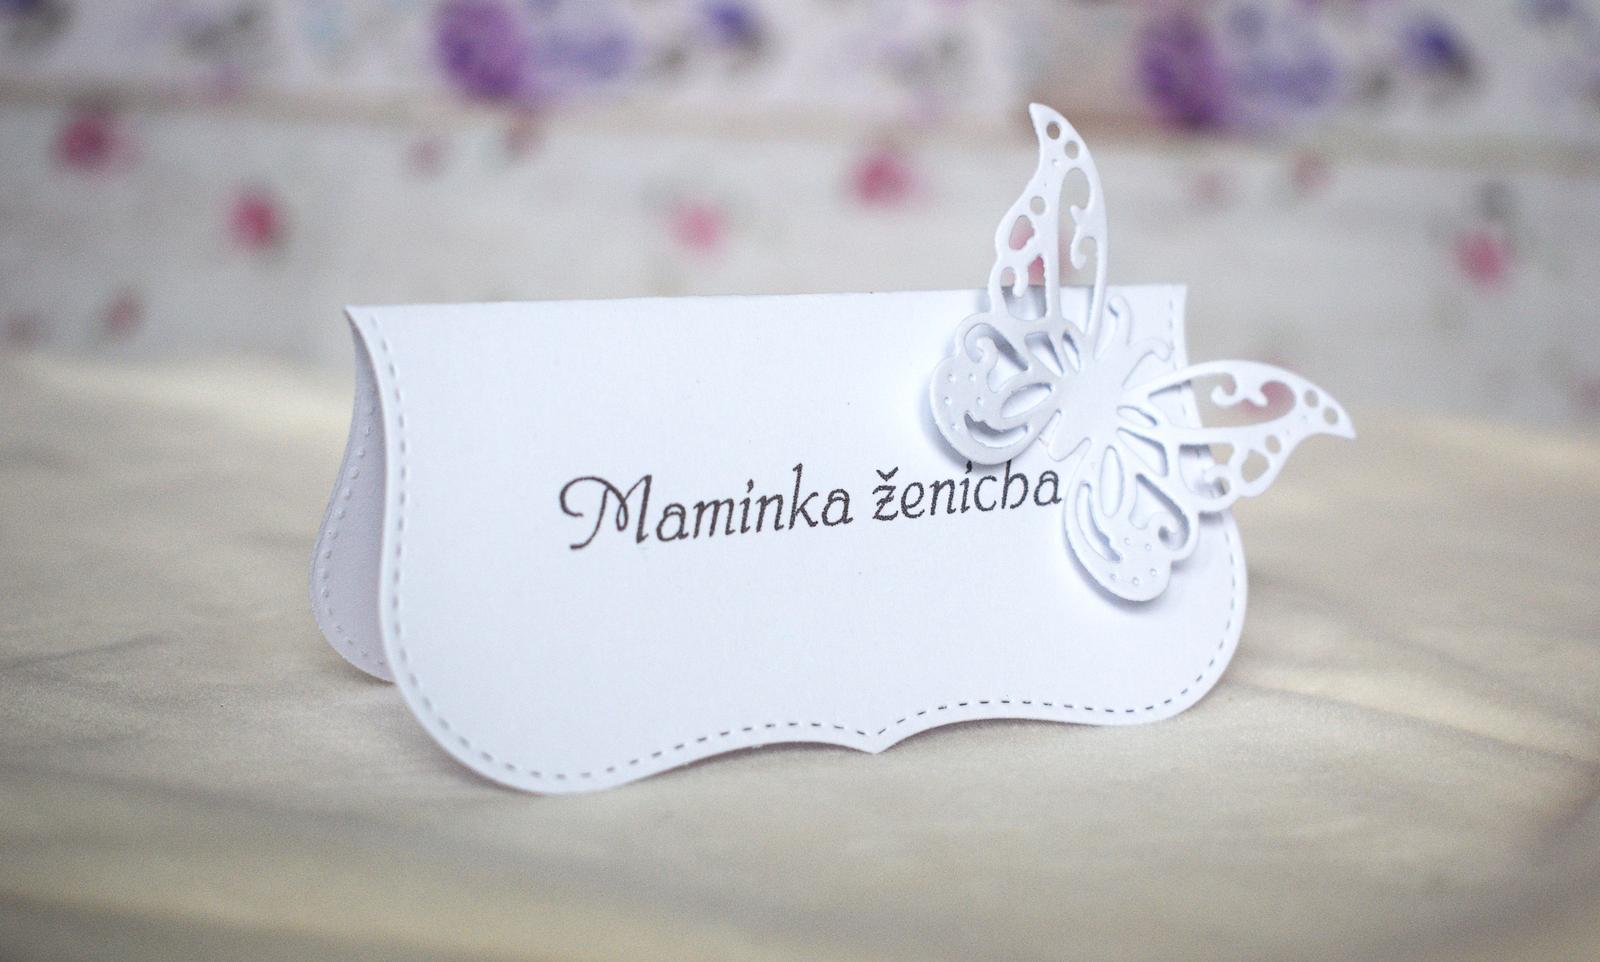 erika_rekniano - hand made svatební jmenovka na stůl s motýlkem